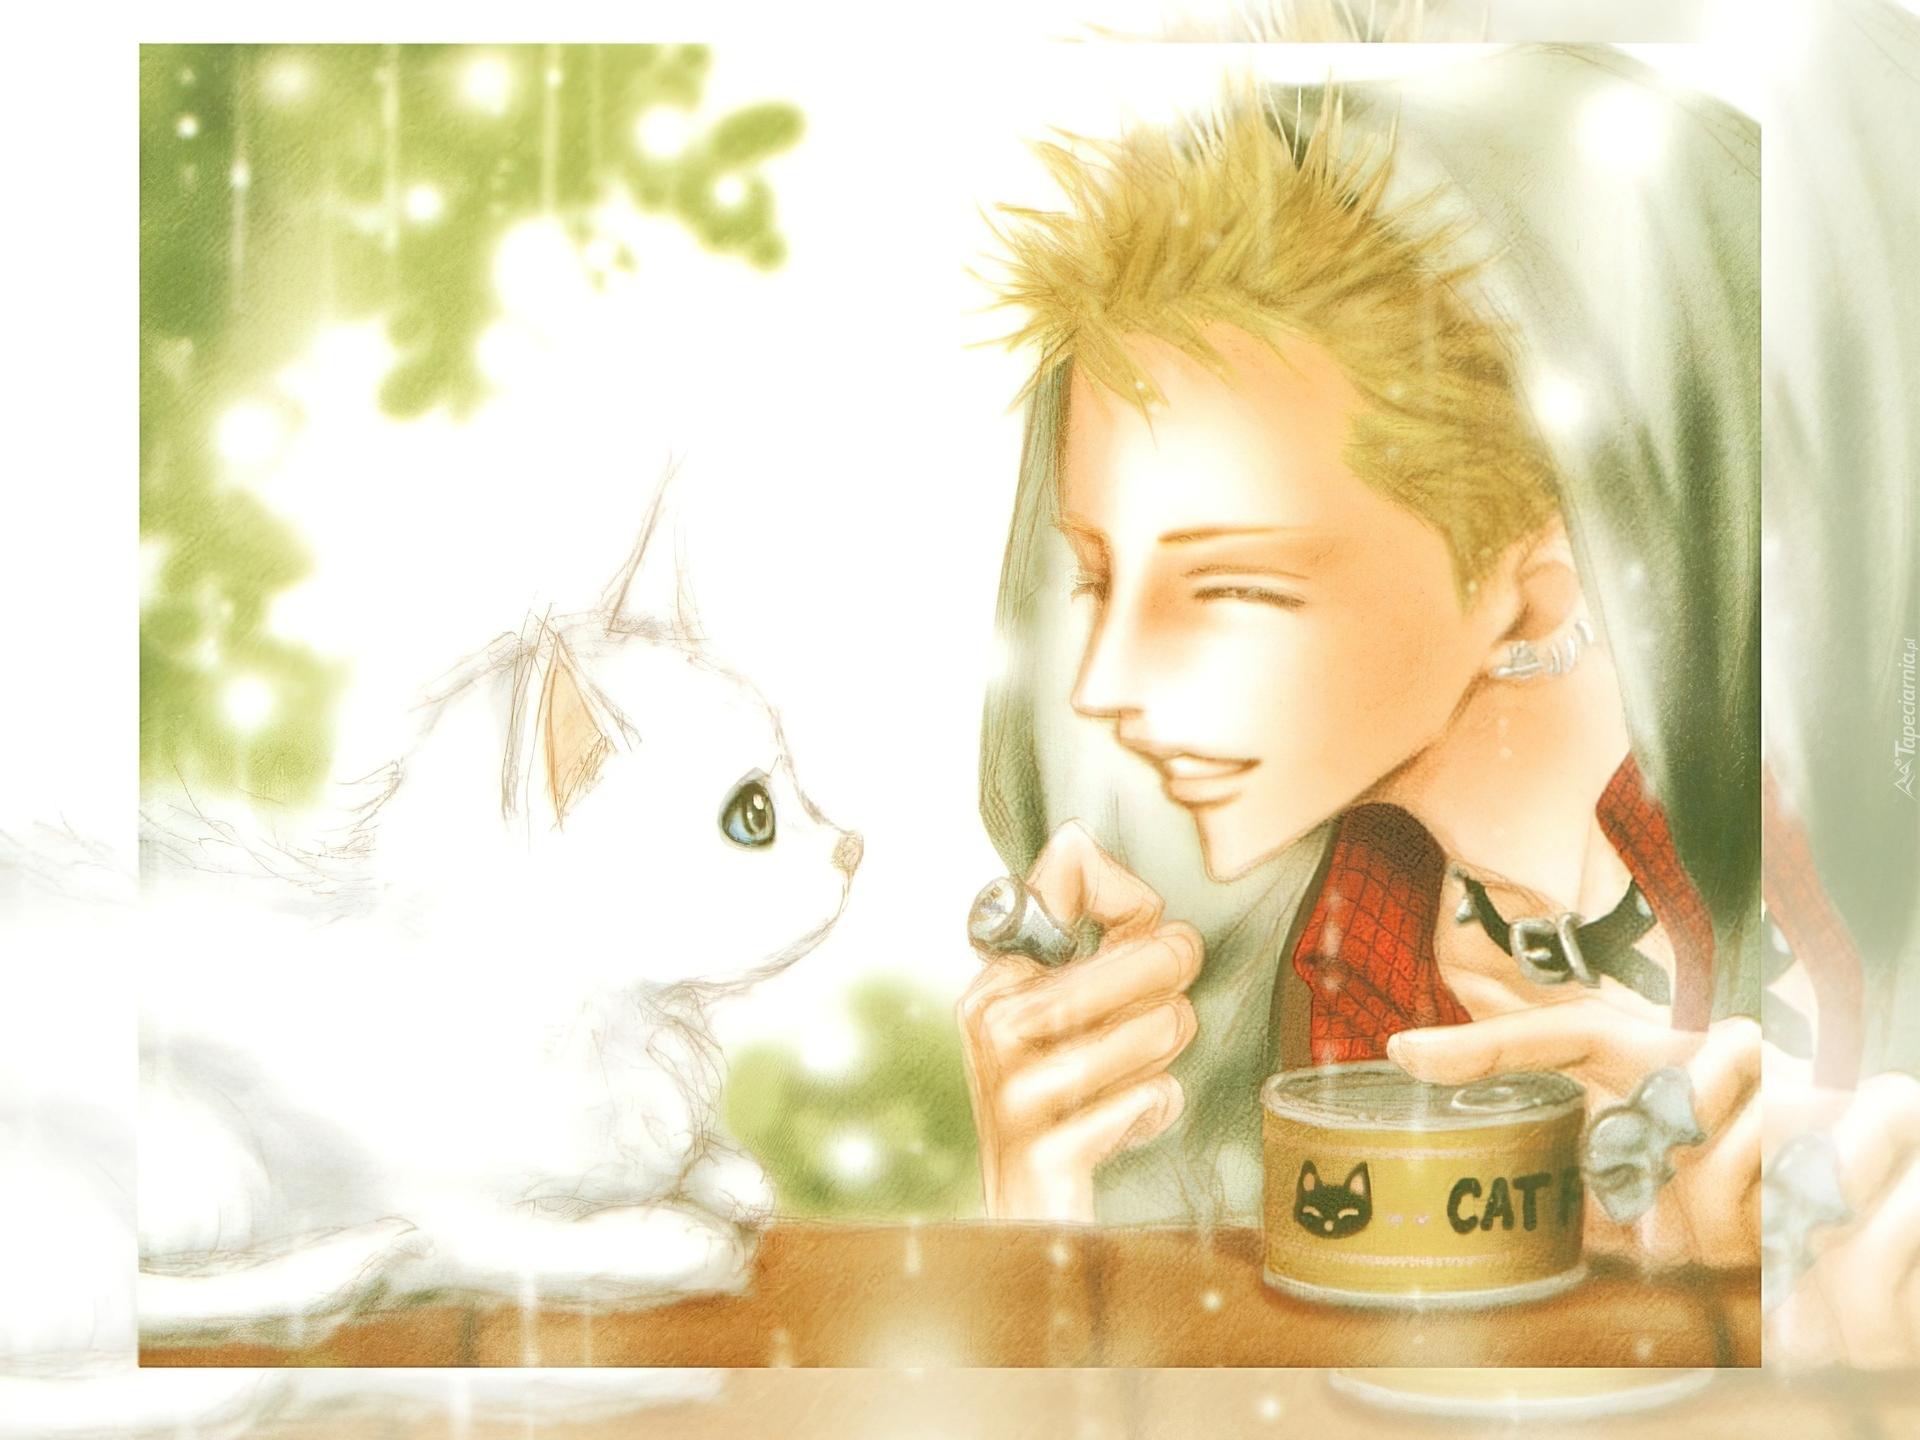 Nana Biały Kot Kobieta